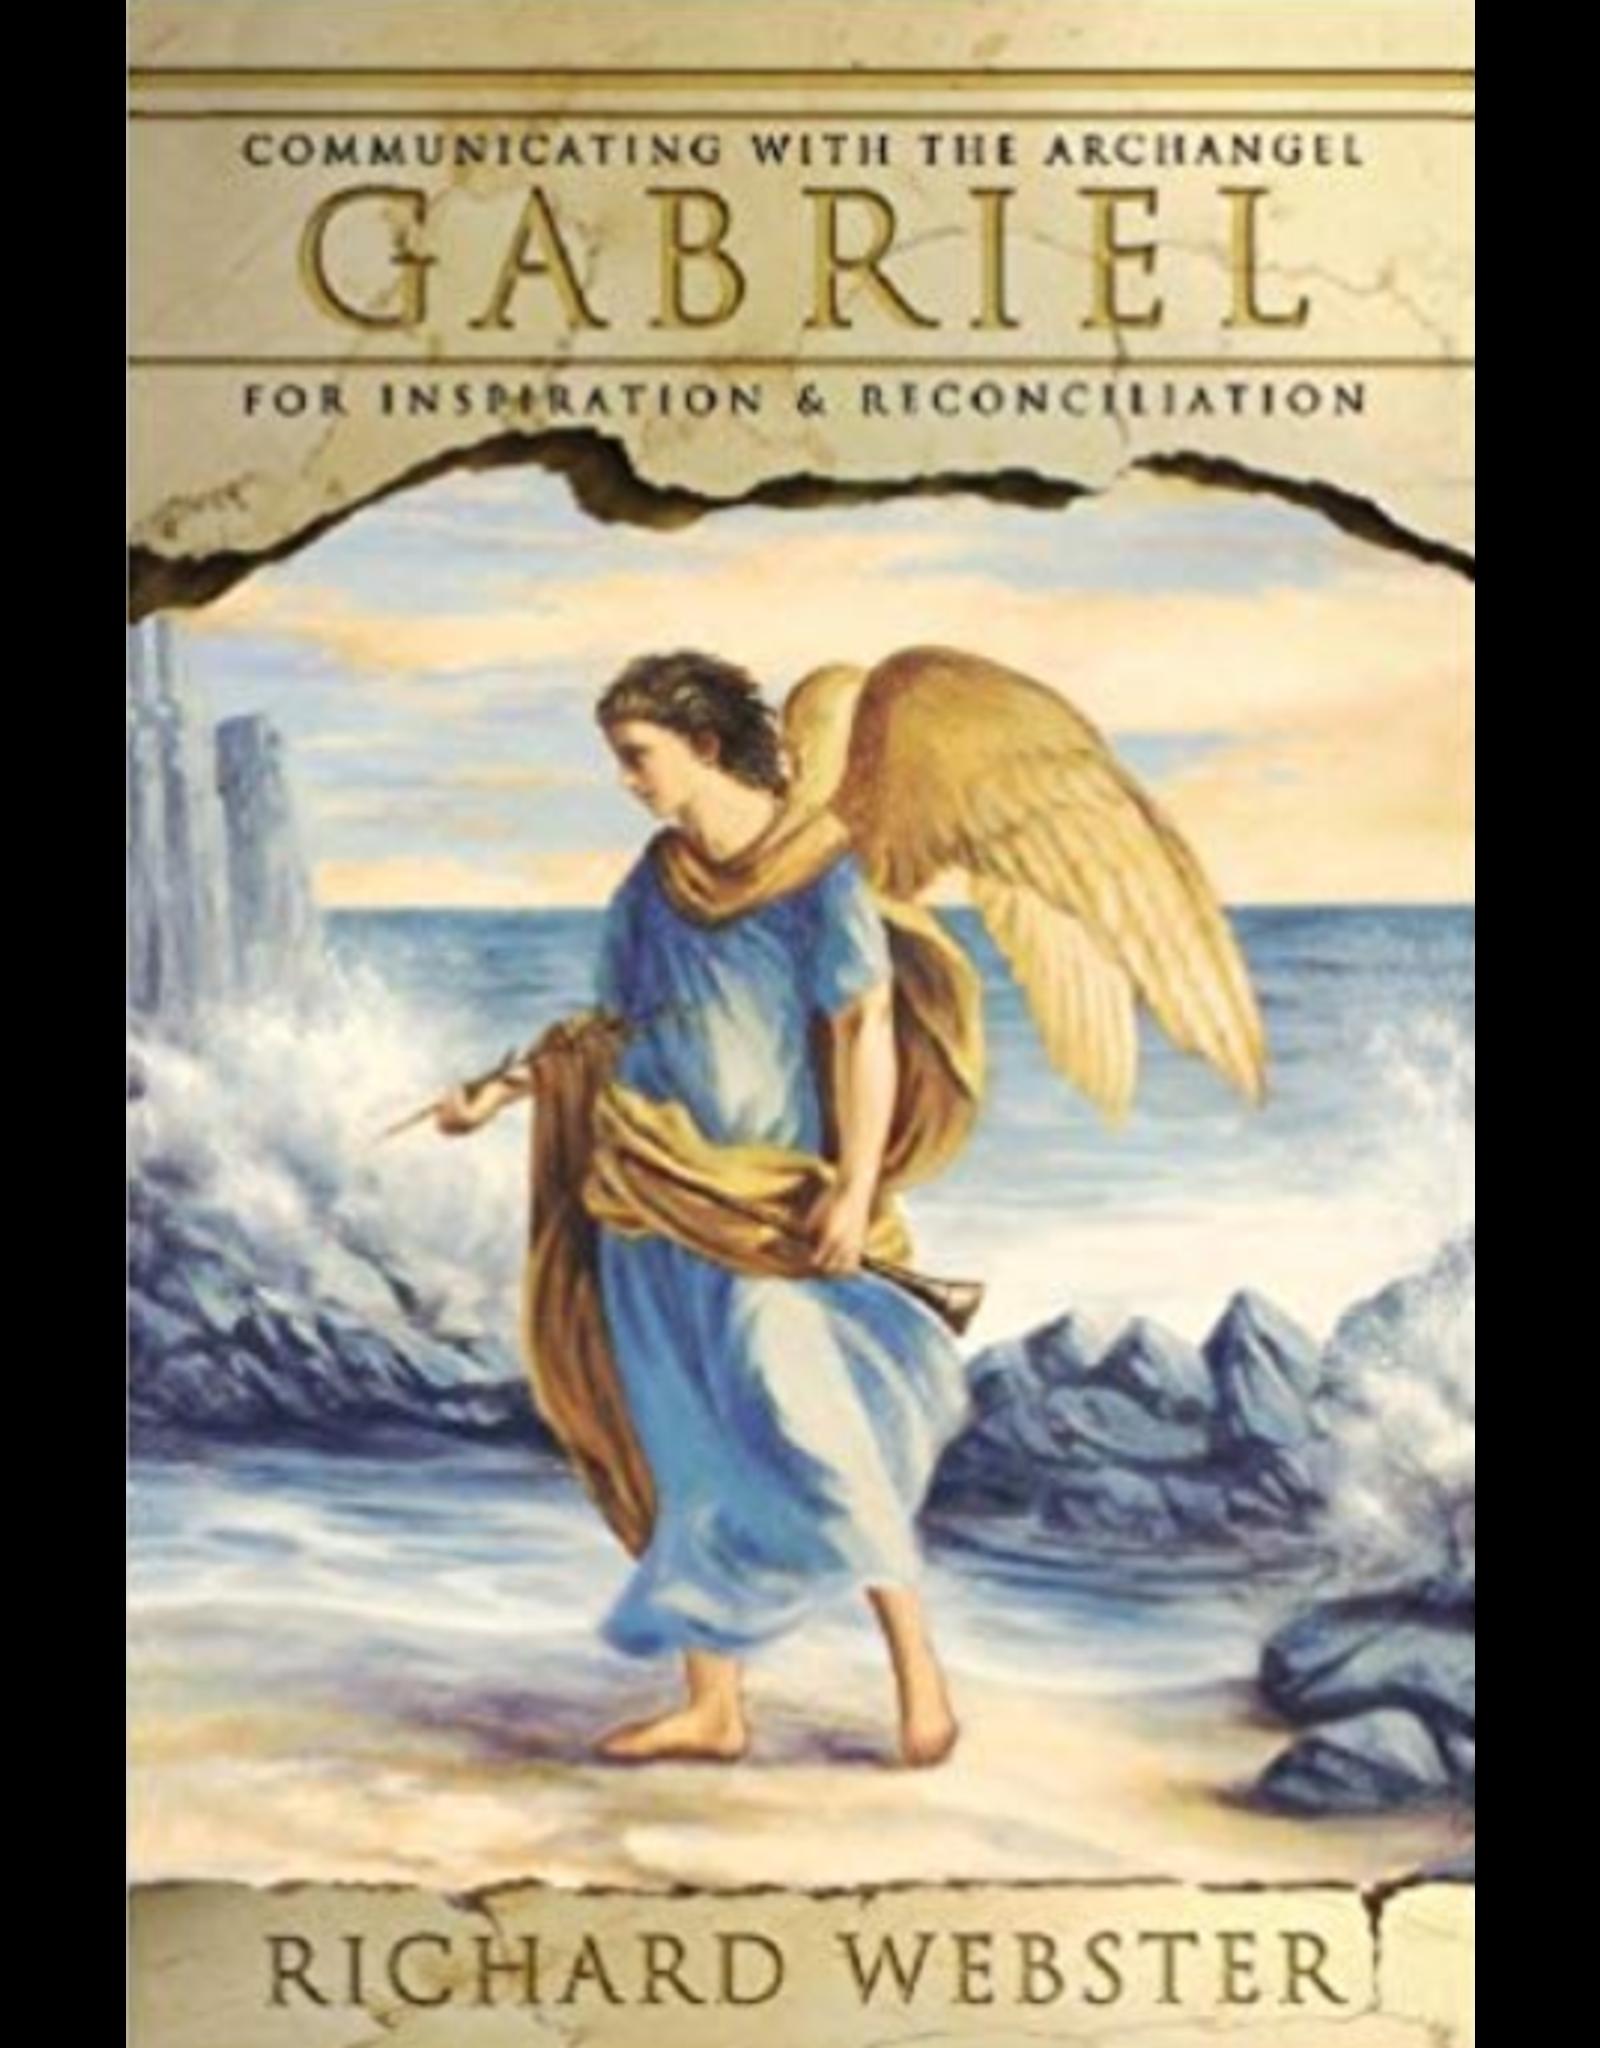 Communicating with Archangel Gabriel